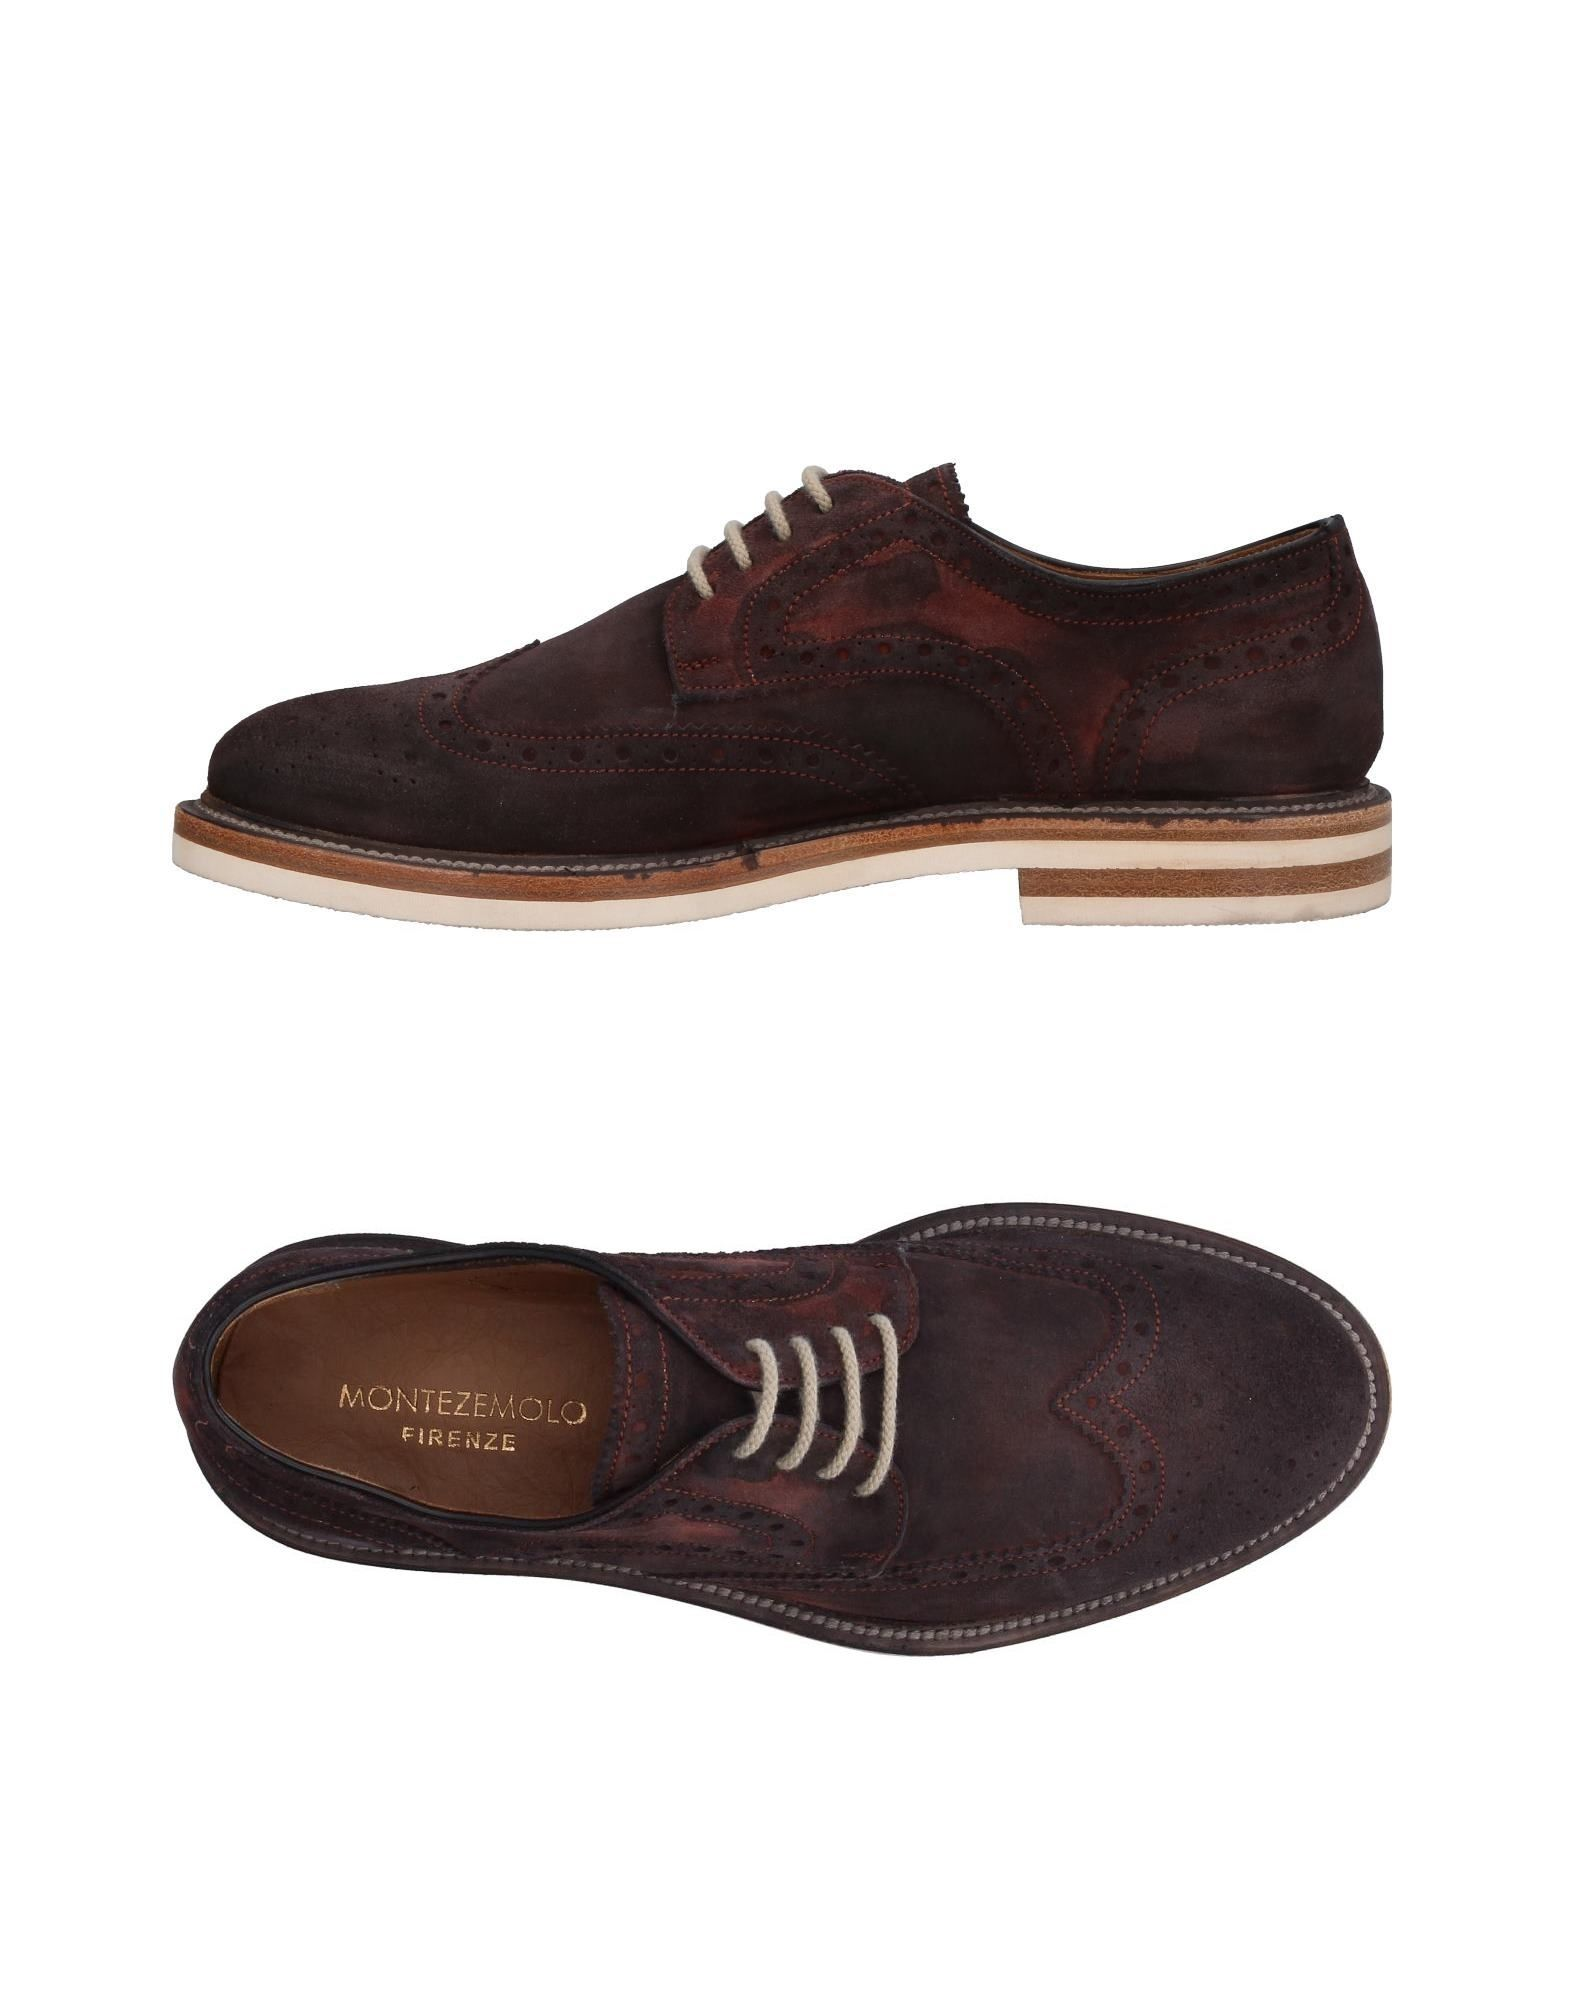 MONTEZEMOLO Laced Shoes in Deep Purple